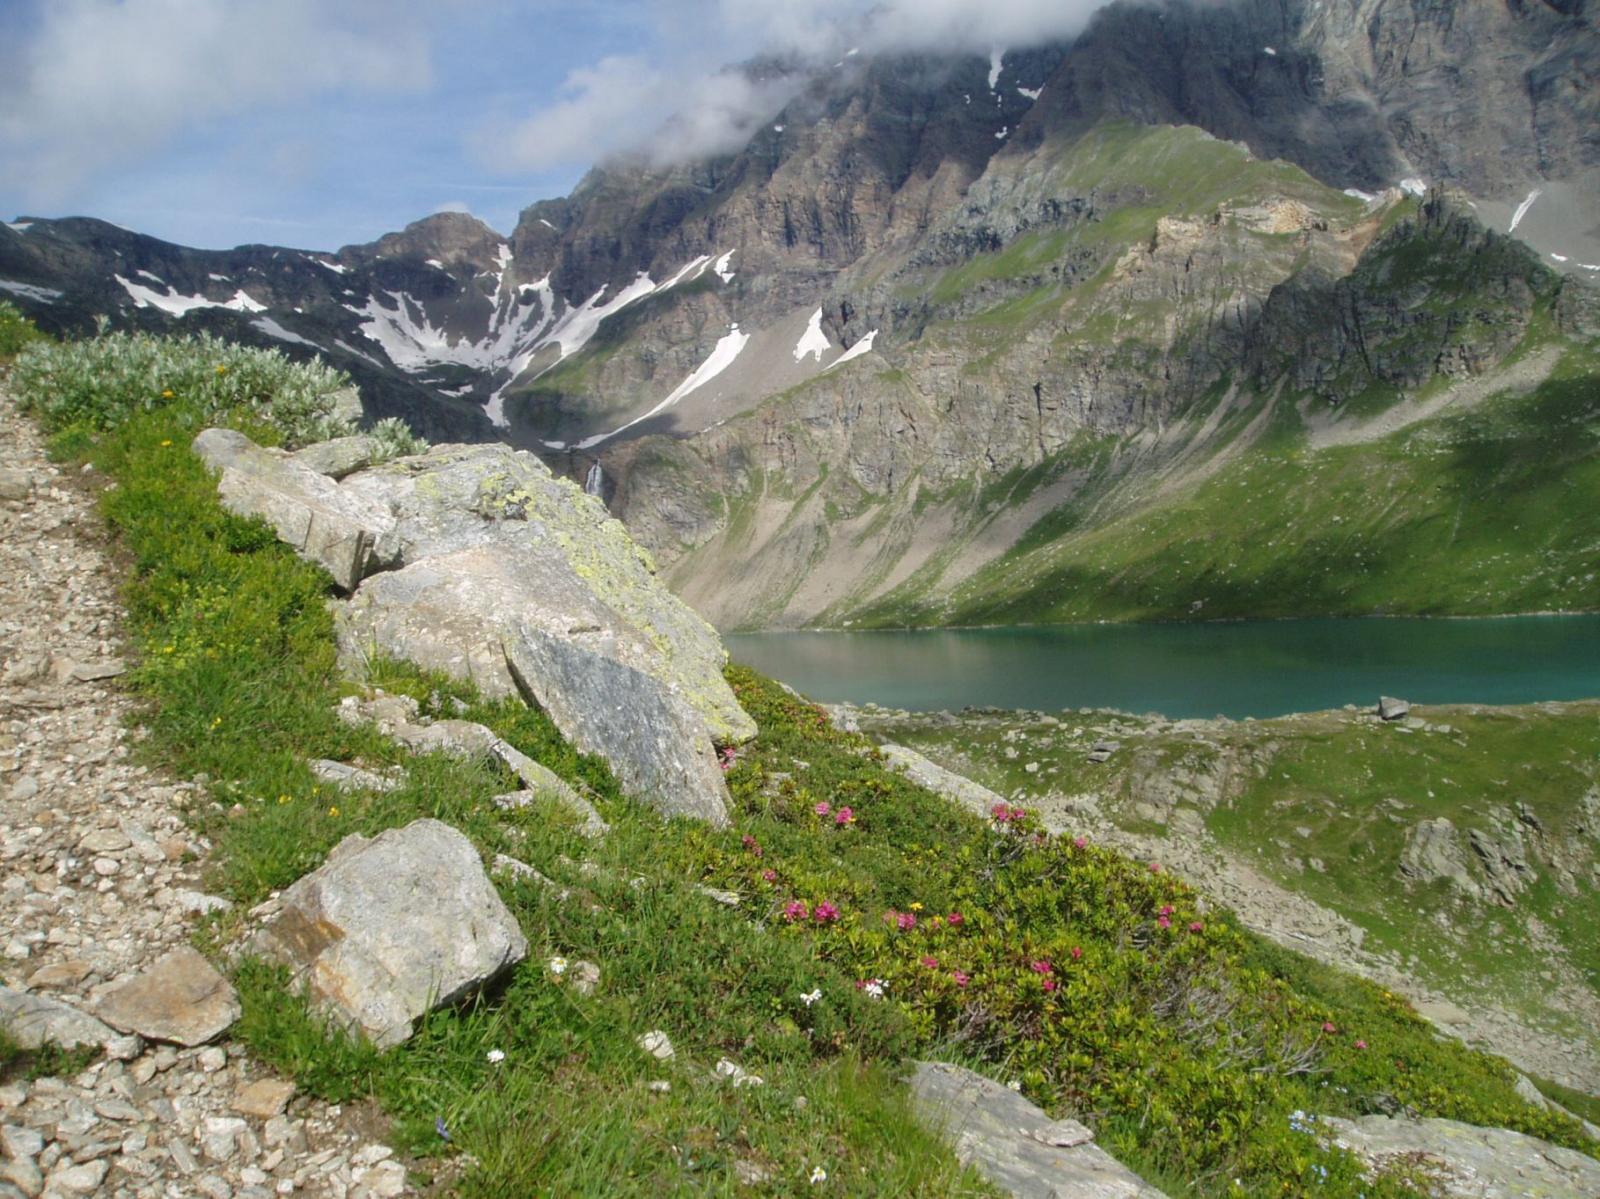 lago serrù